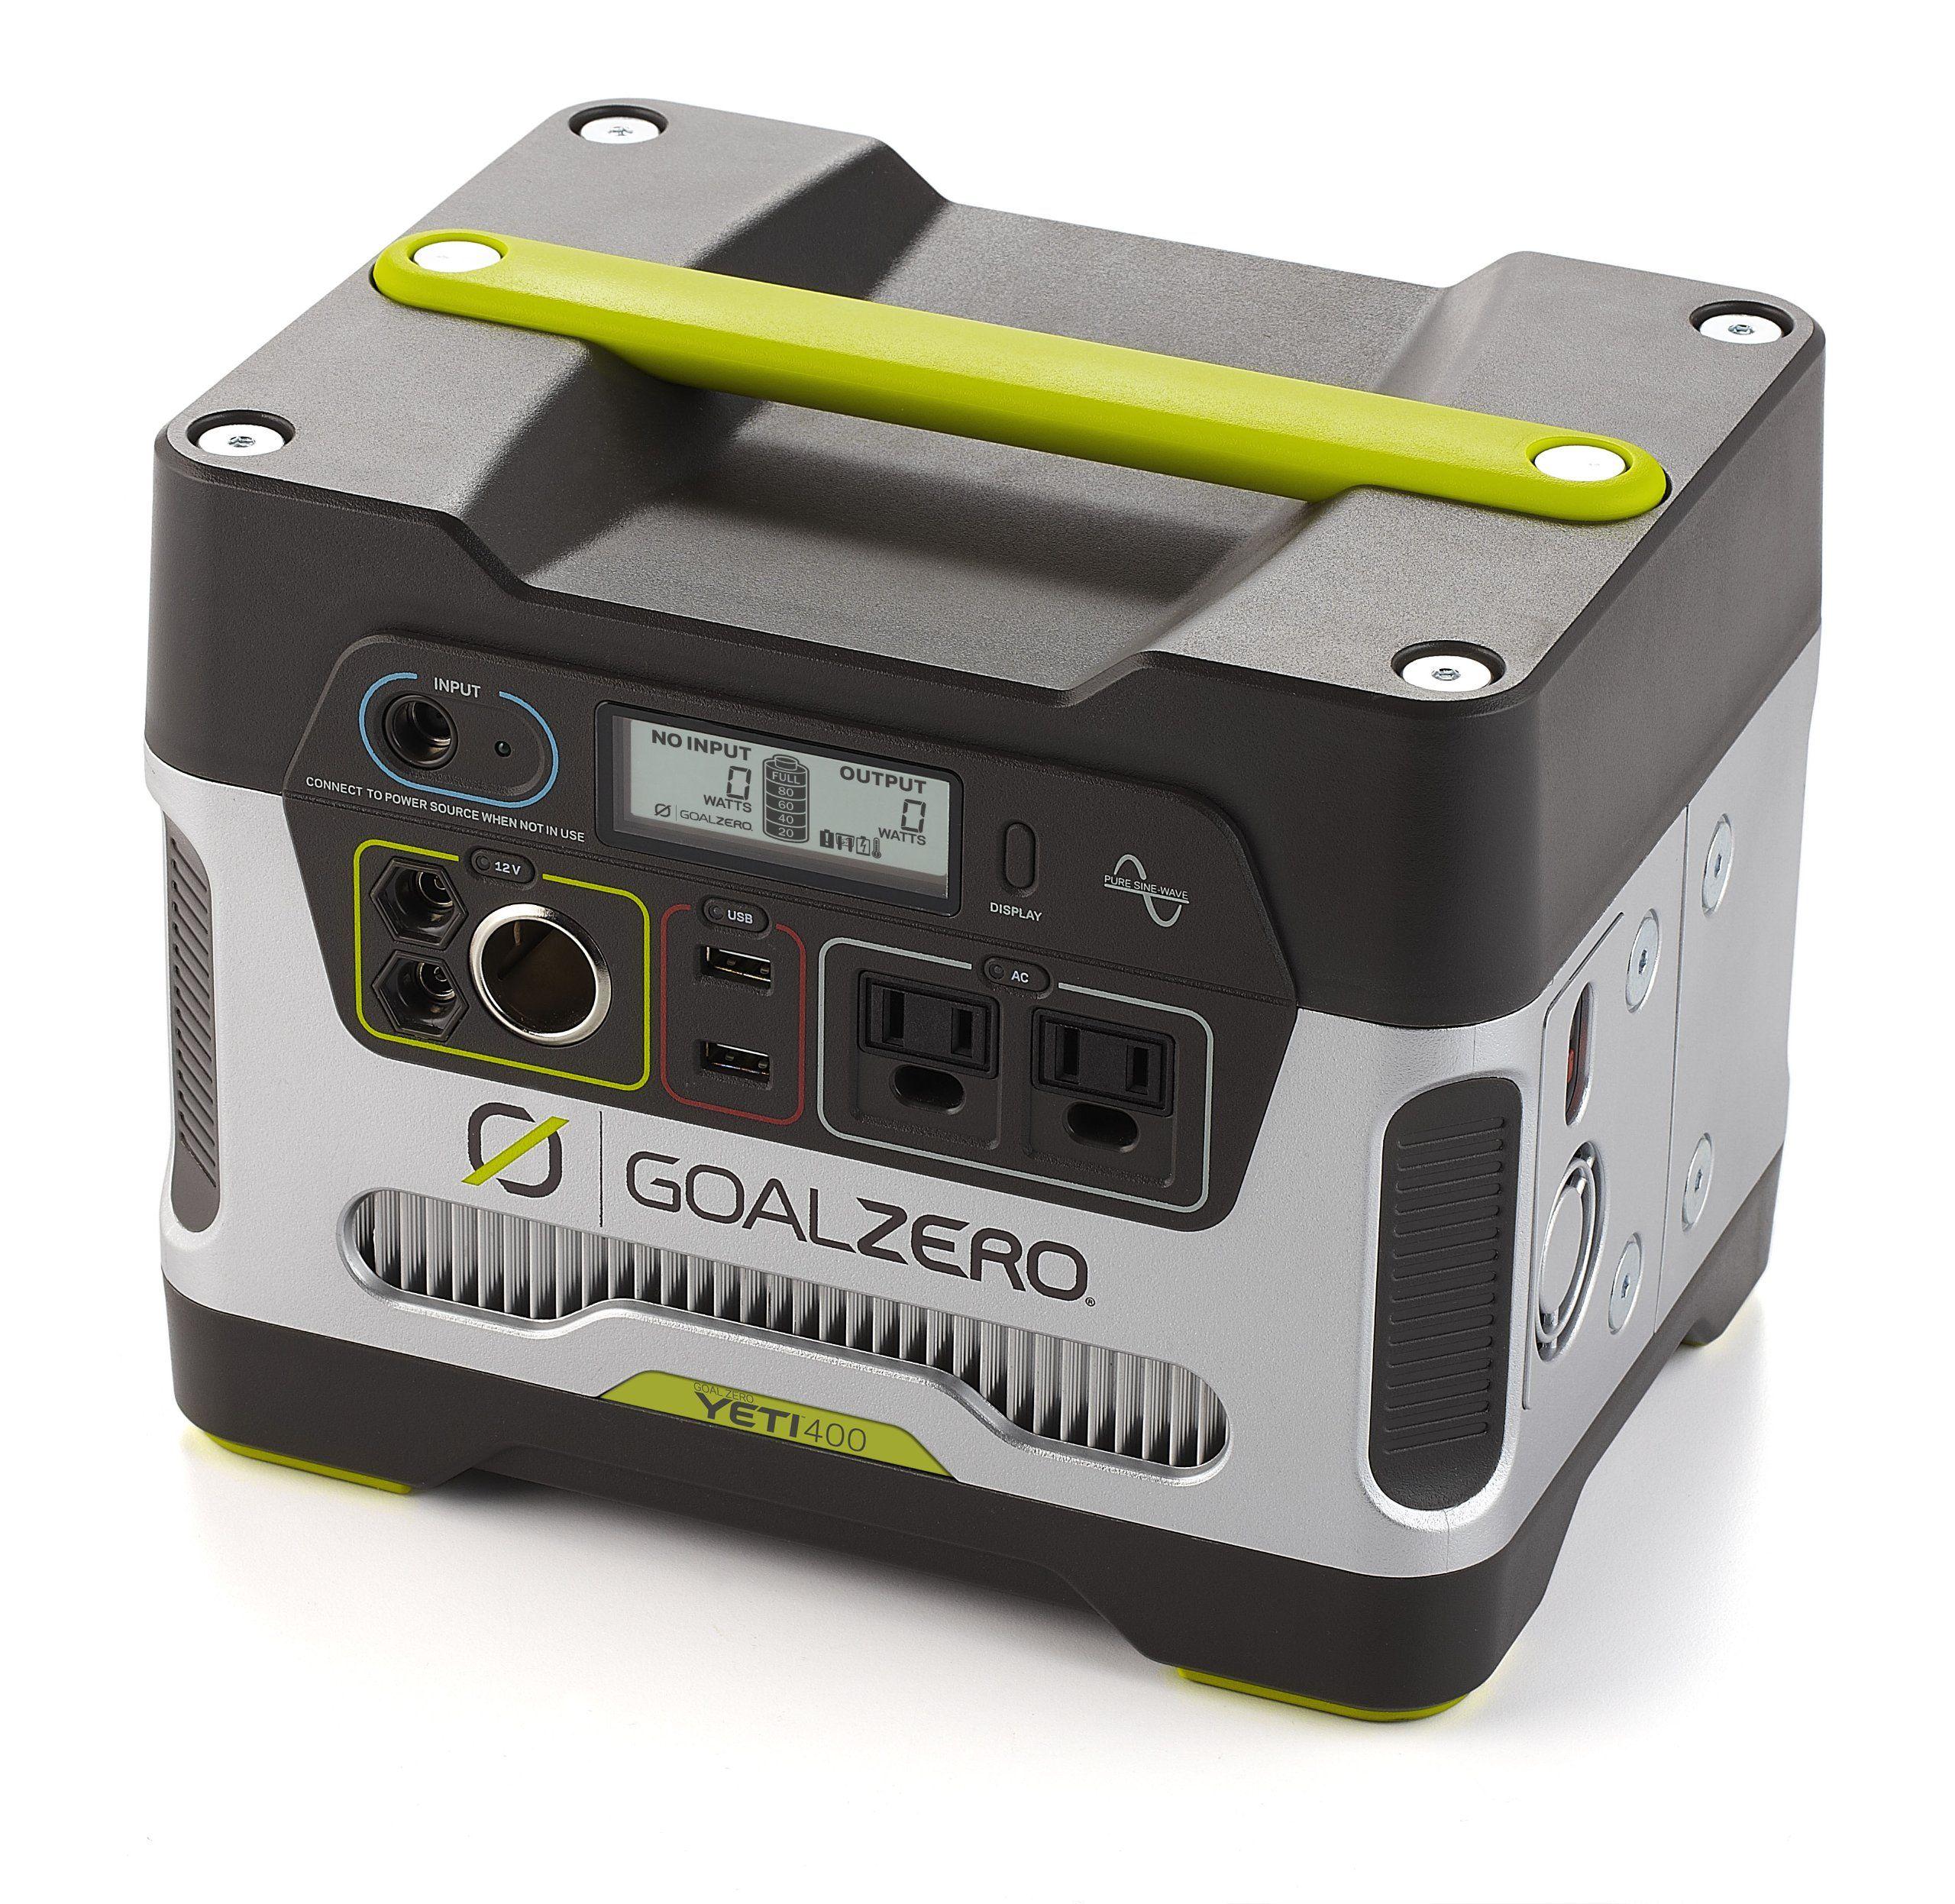 Goal Zero Yeti 400 Solar Generator Quiet portable power